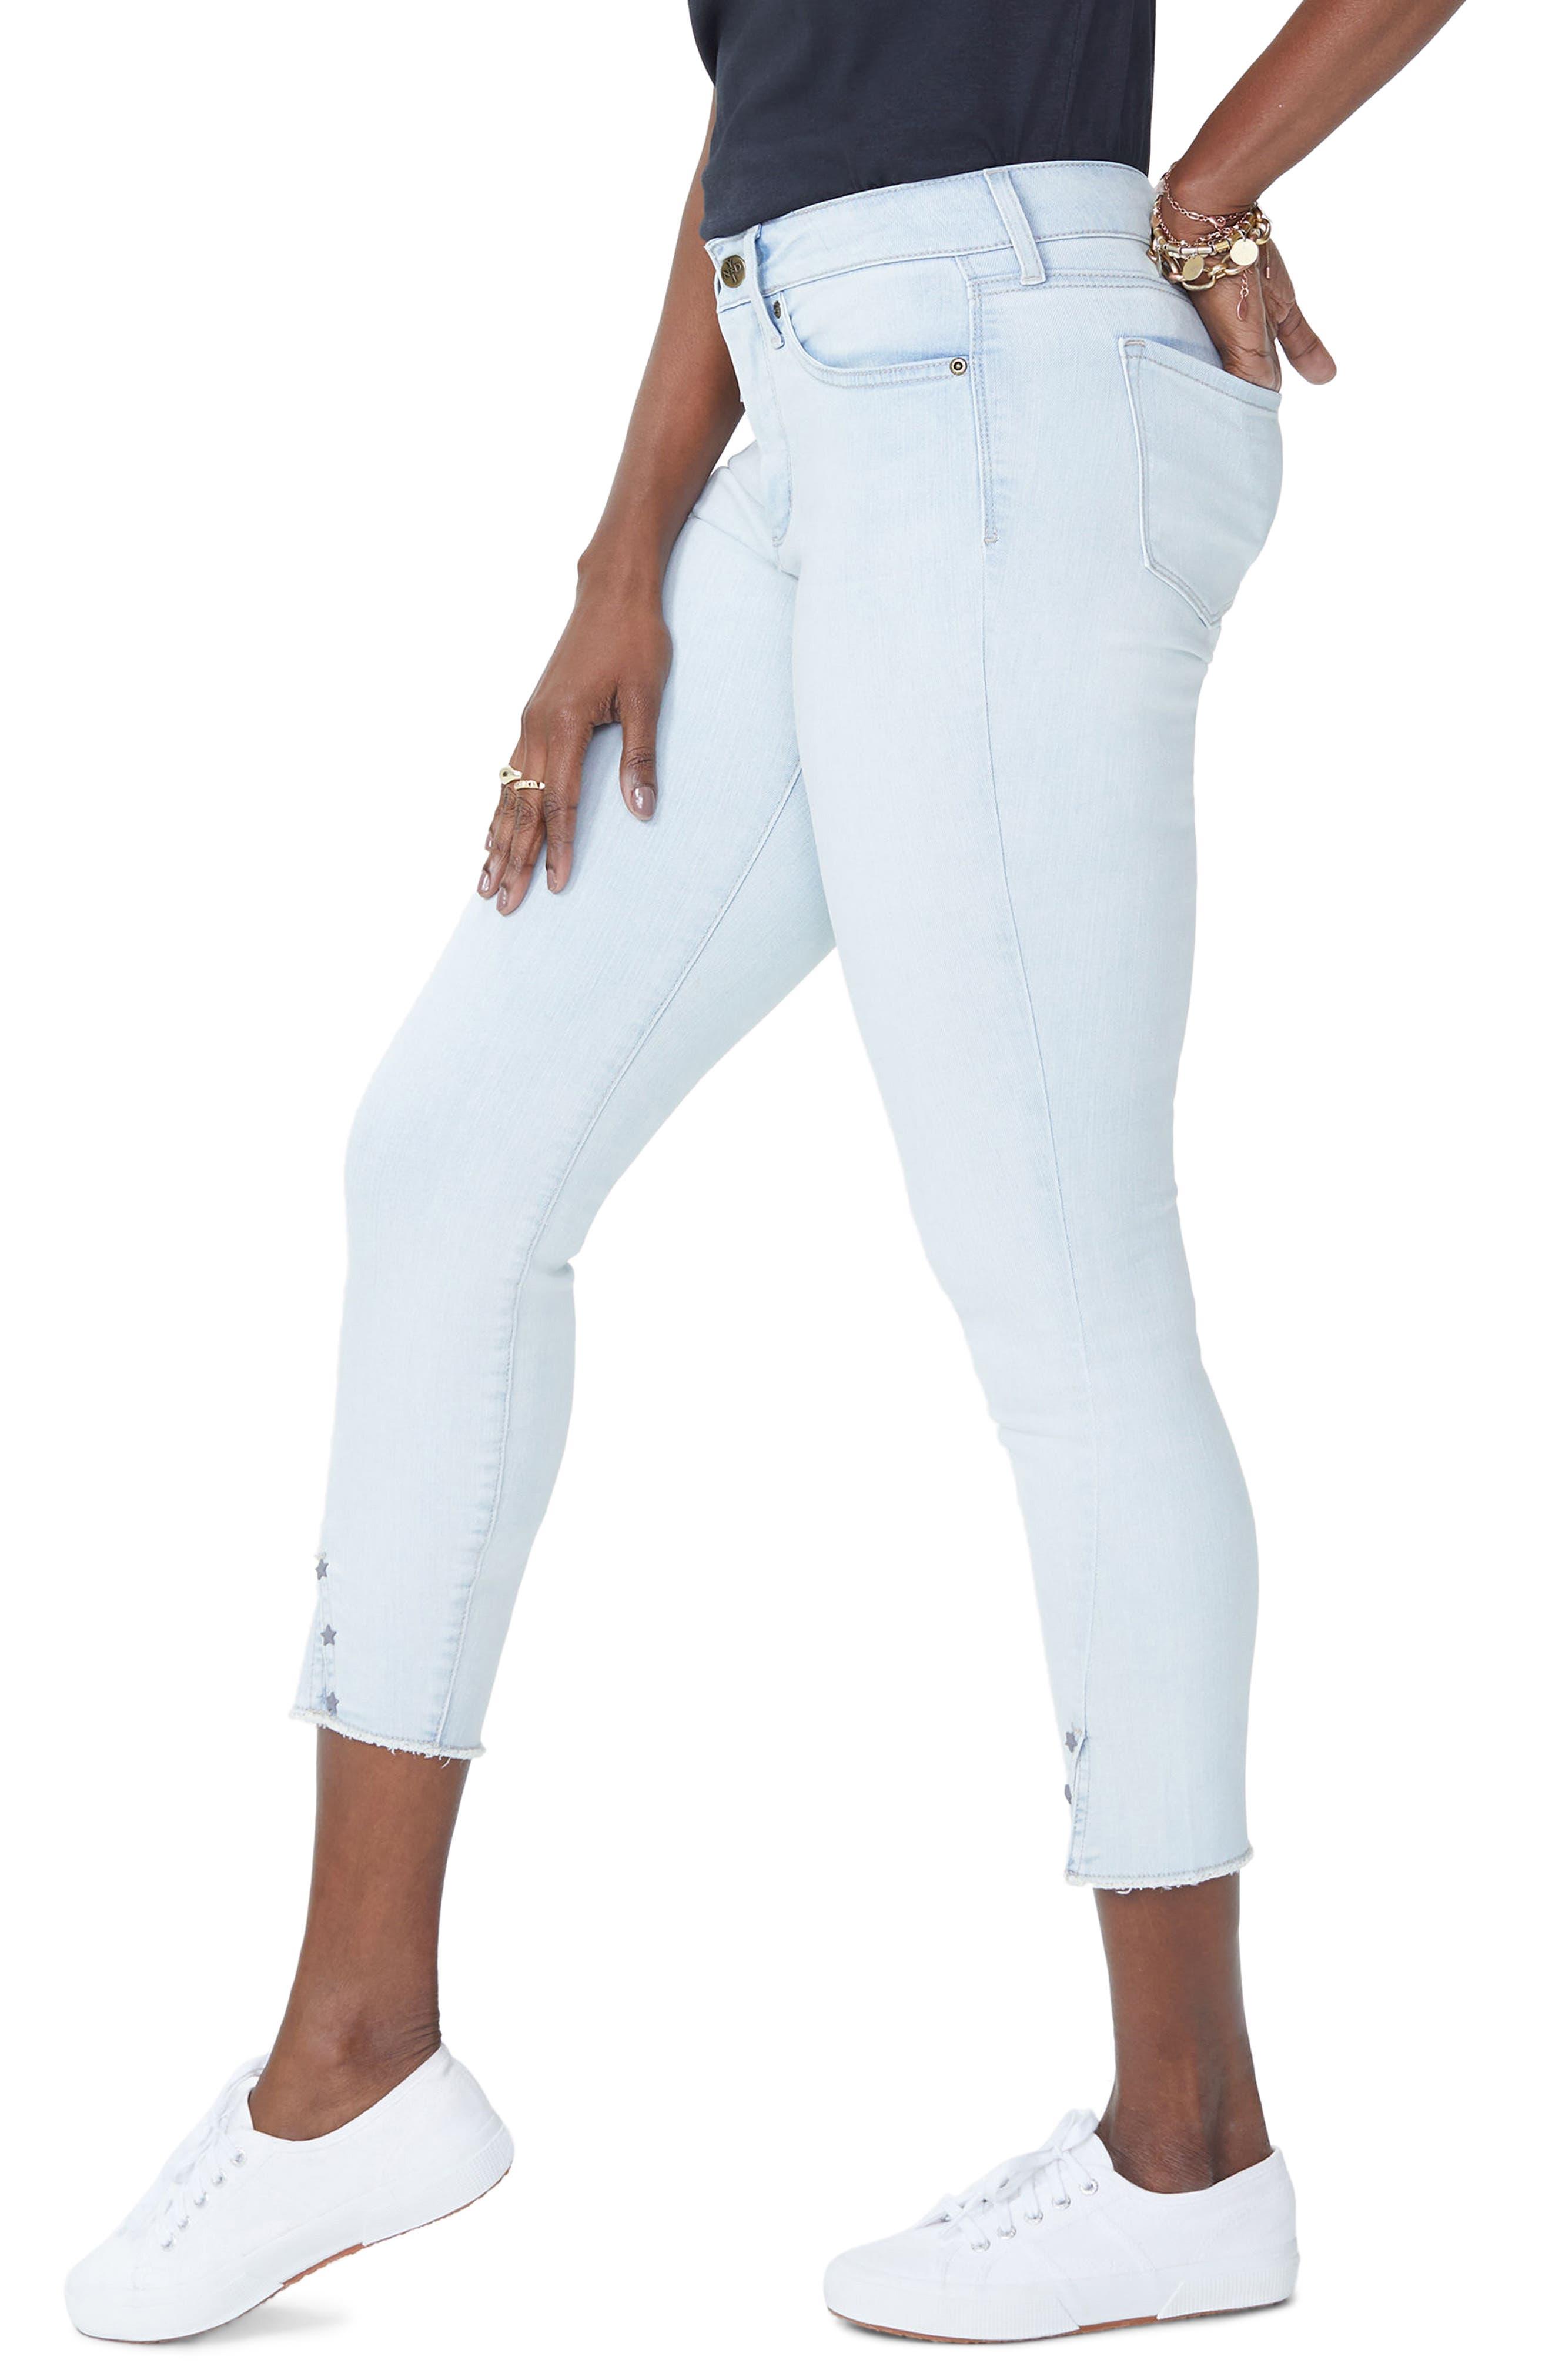 Ami High Waist Twist Seam Stretch Ankle Skinny Jeans,                             Alternate thumbnail 3, color,                             PALM DESERT